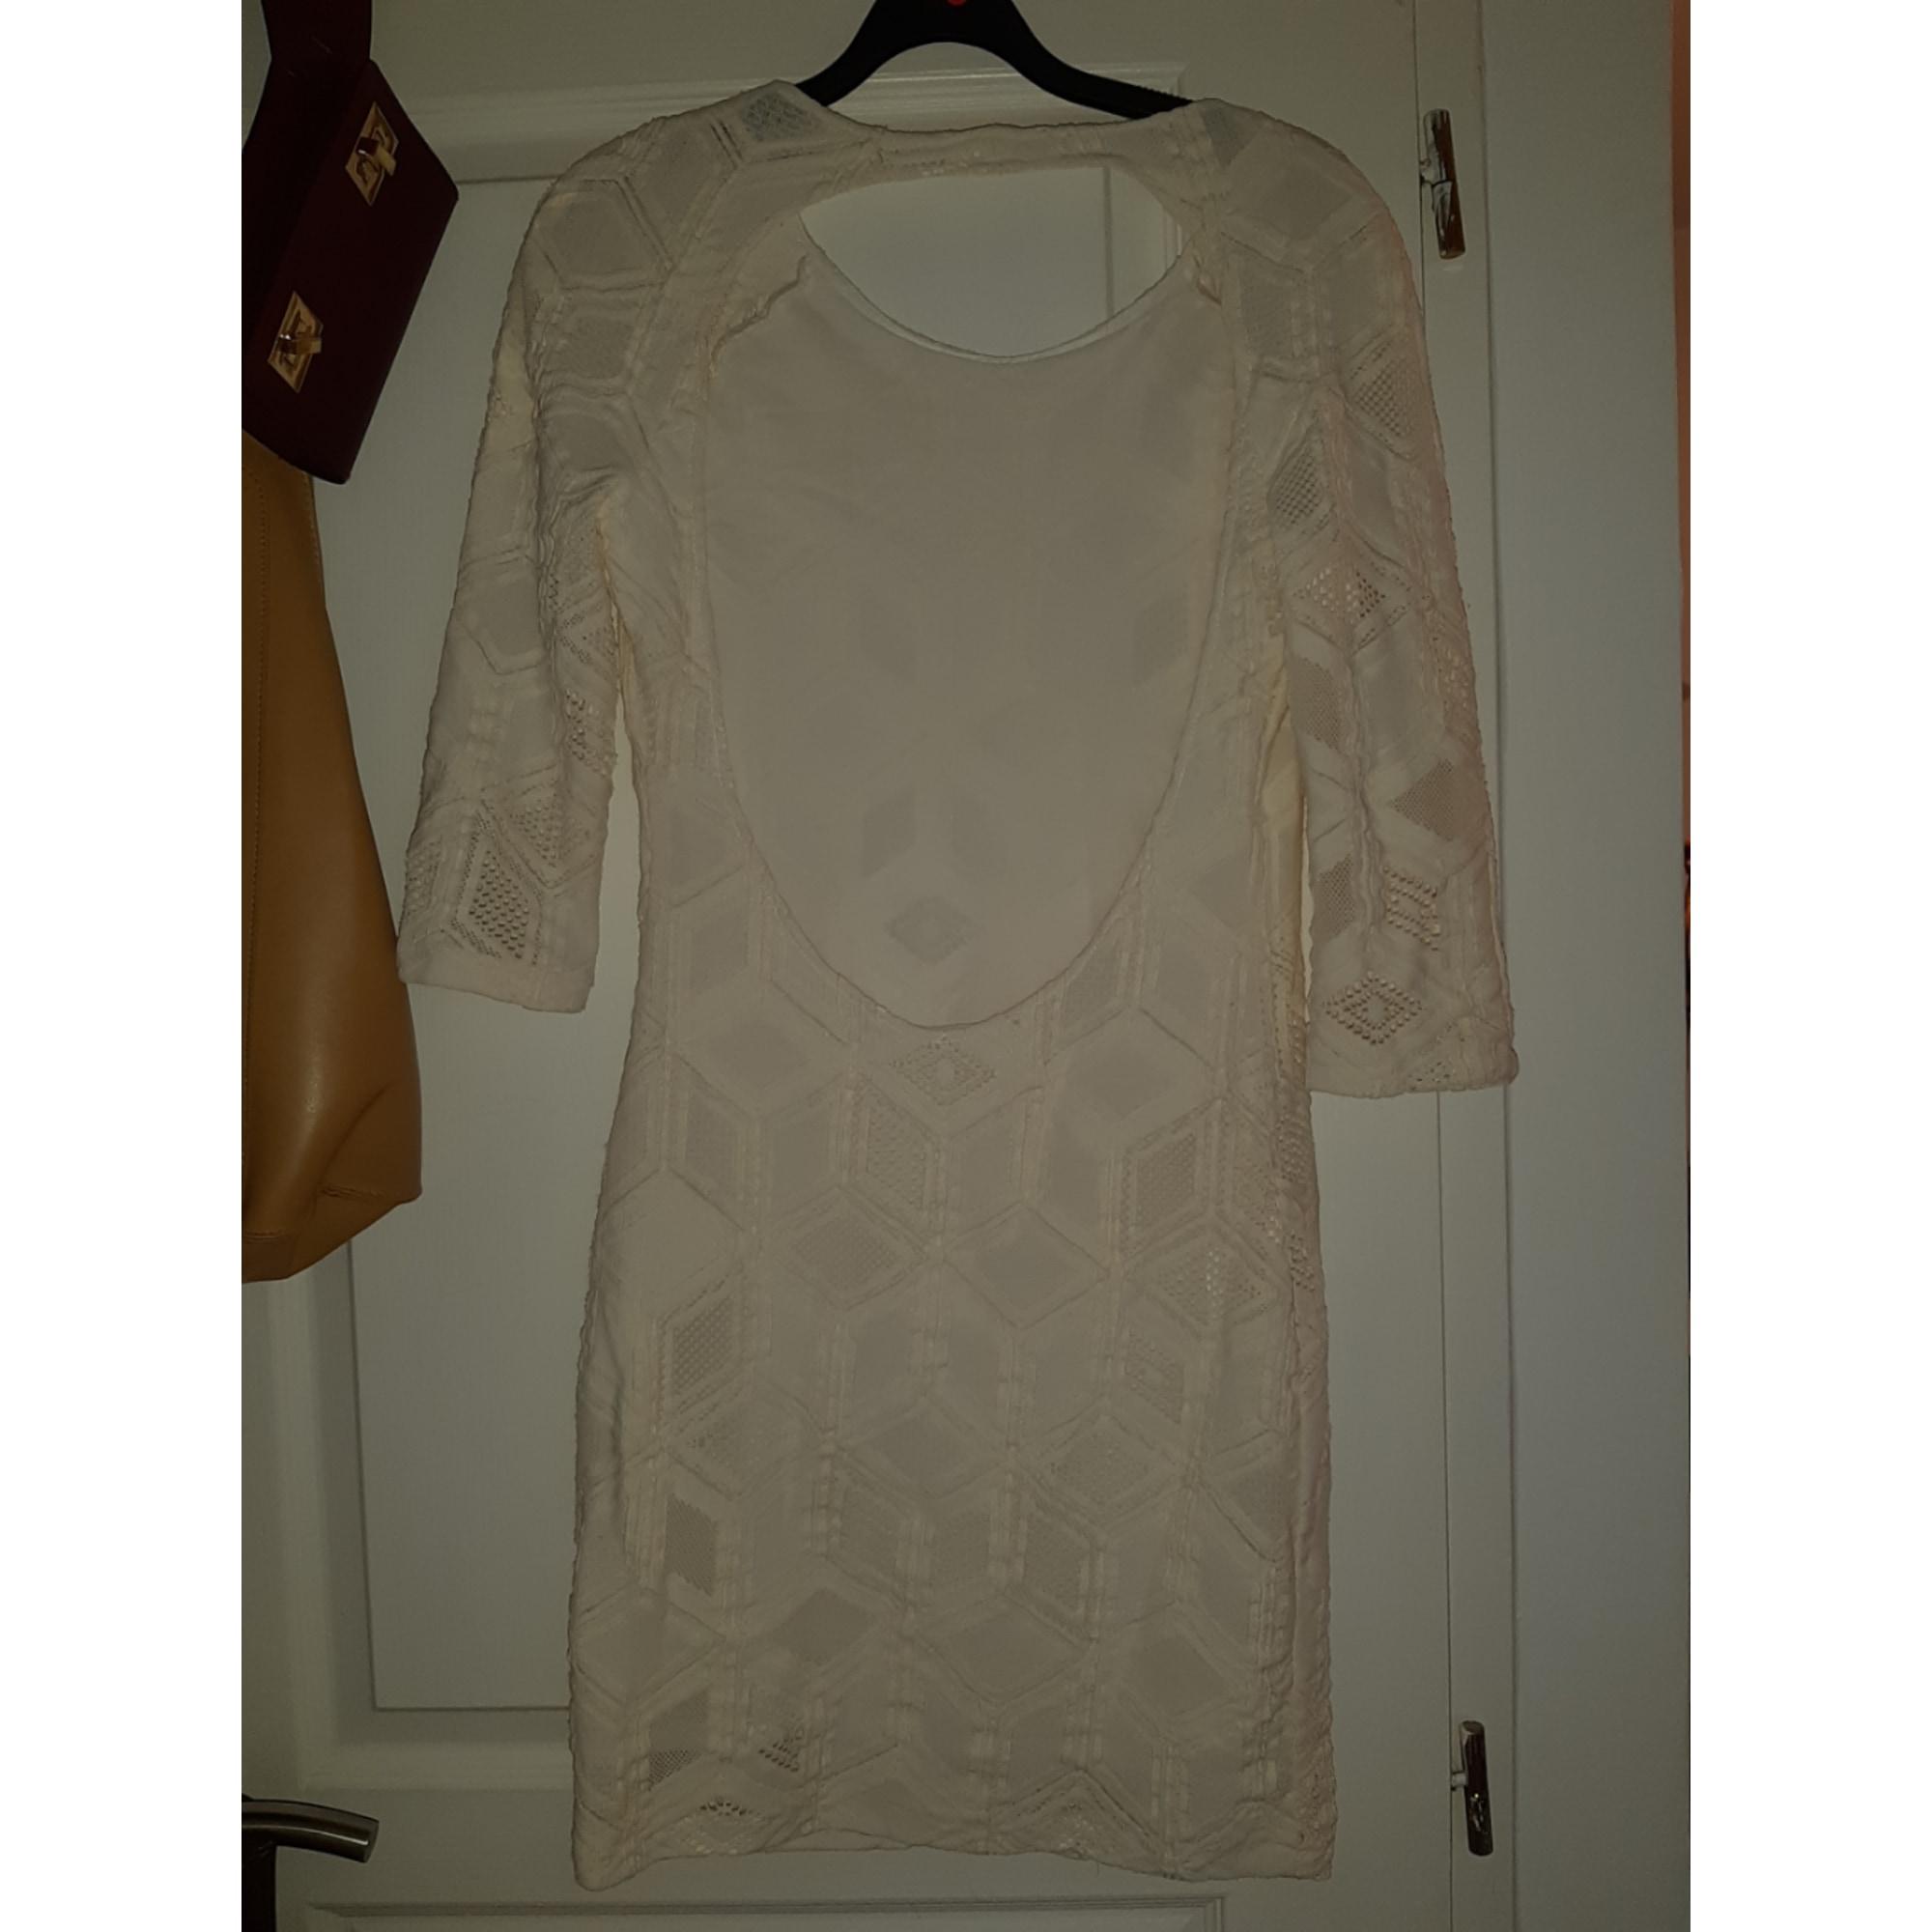 Robe mi-longue BA&SH Blanc, blanc cassé, écru